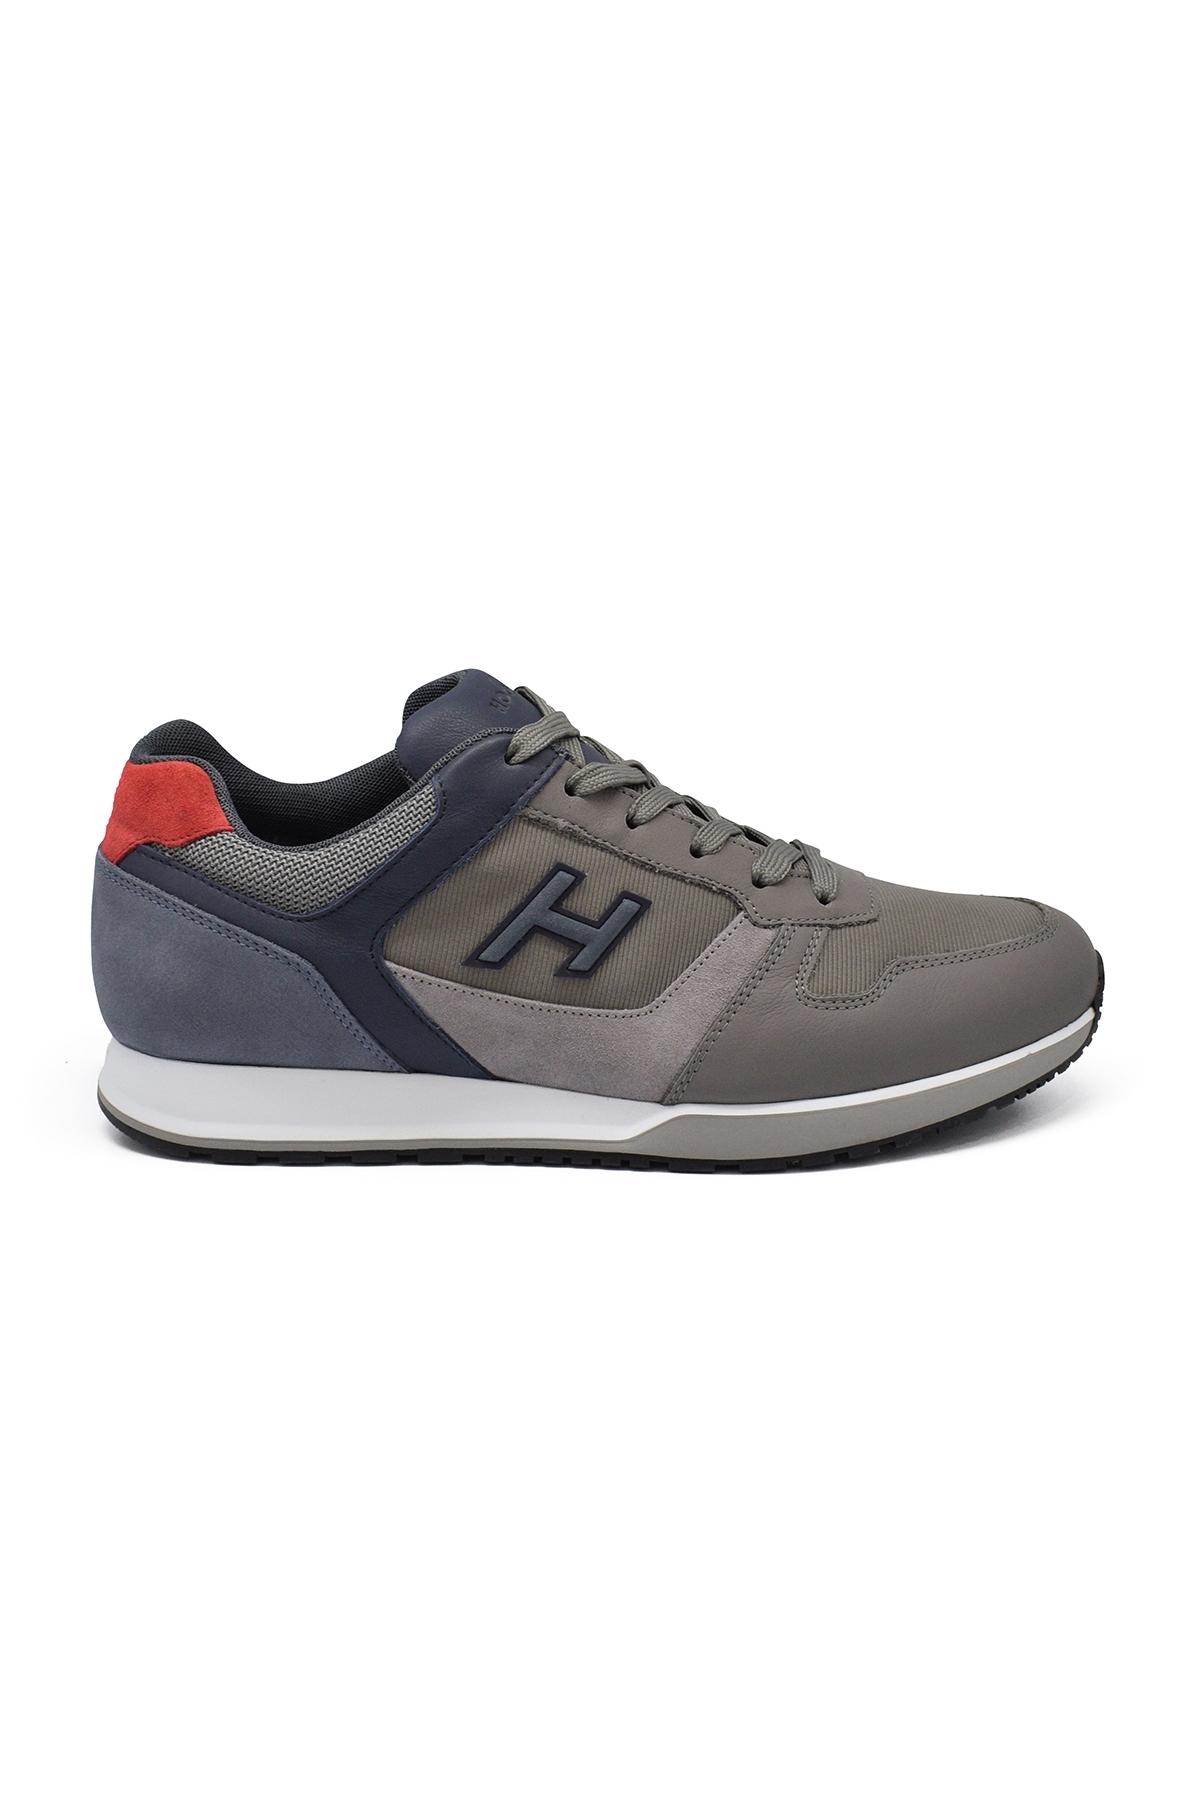 H321 sneakers